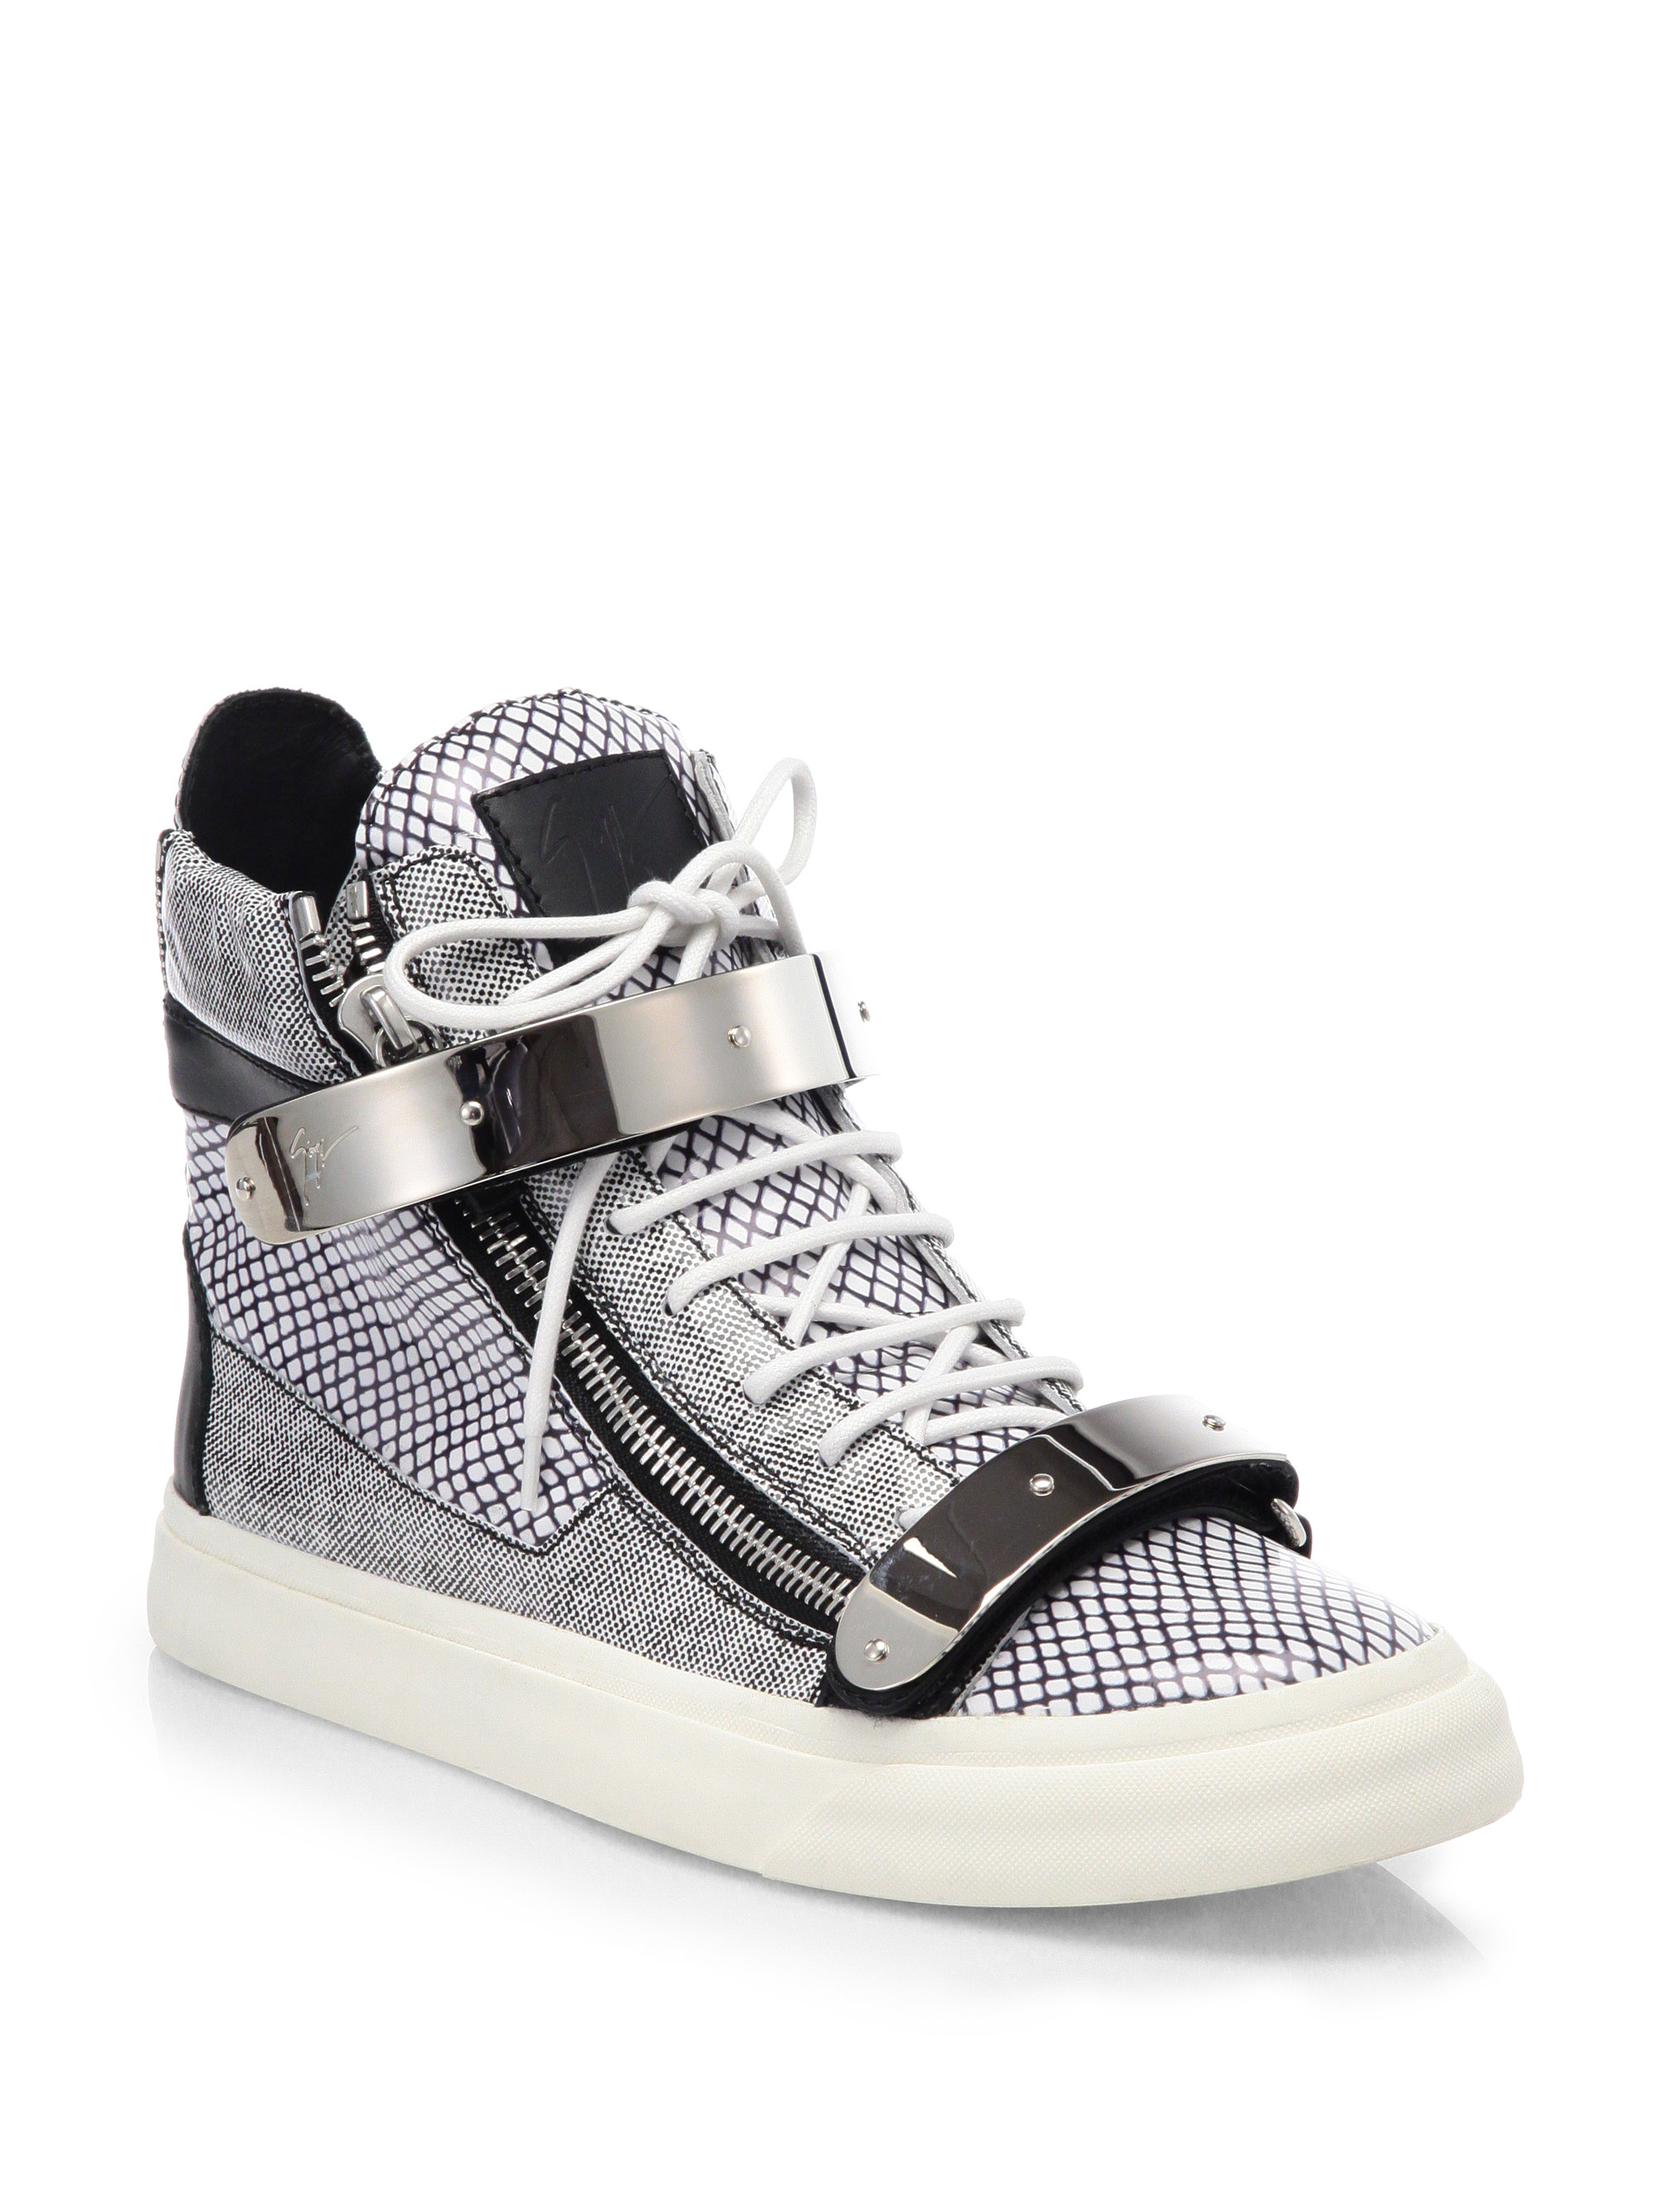 Lyst Giuseppe Zanotti Scribble Hightop Sneakers In White